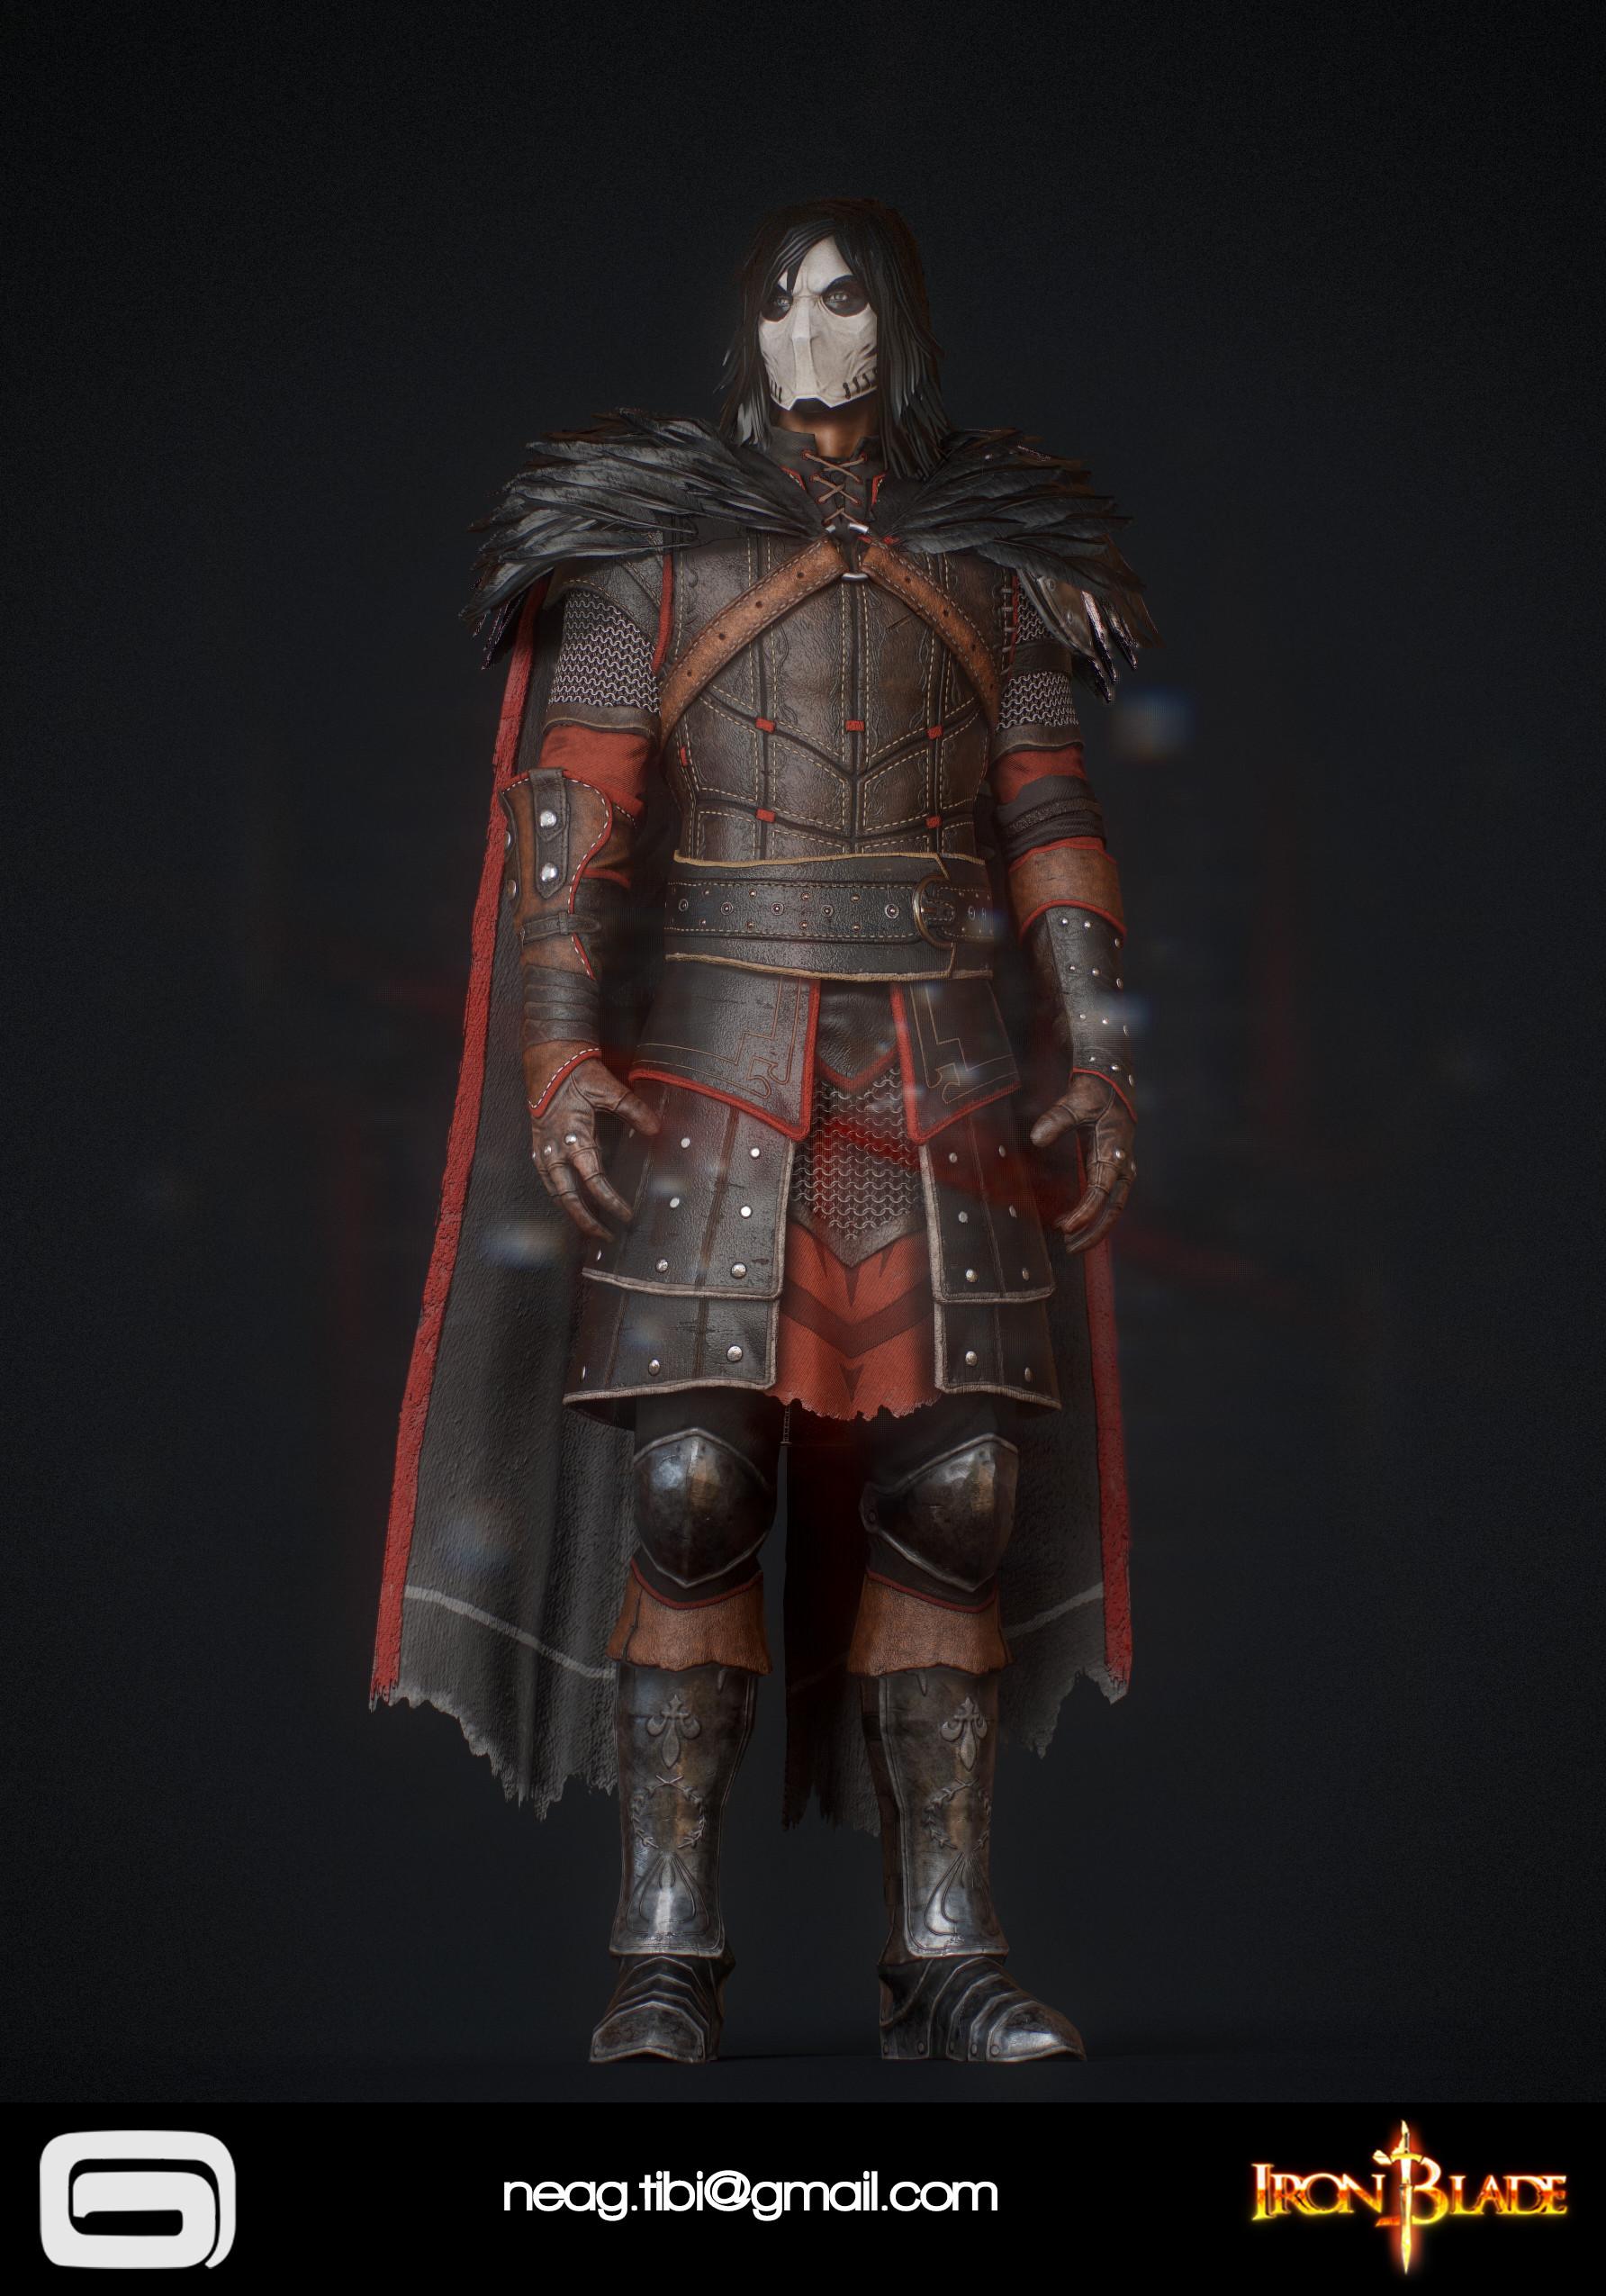 Tibi neag tibi neag iron blade mc armor 11c low poly 02